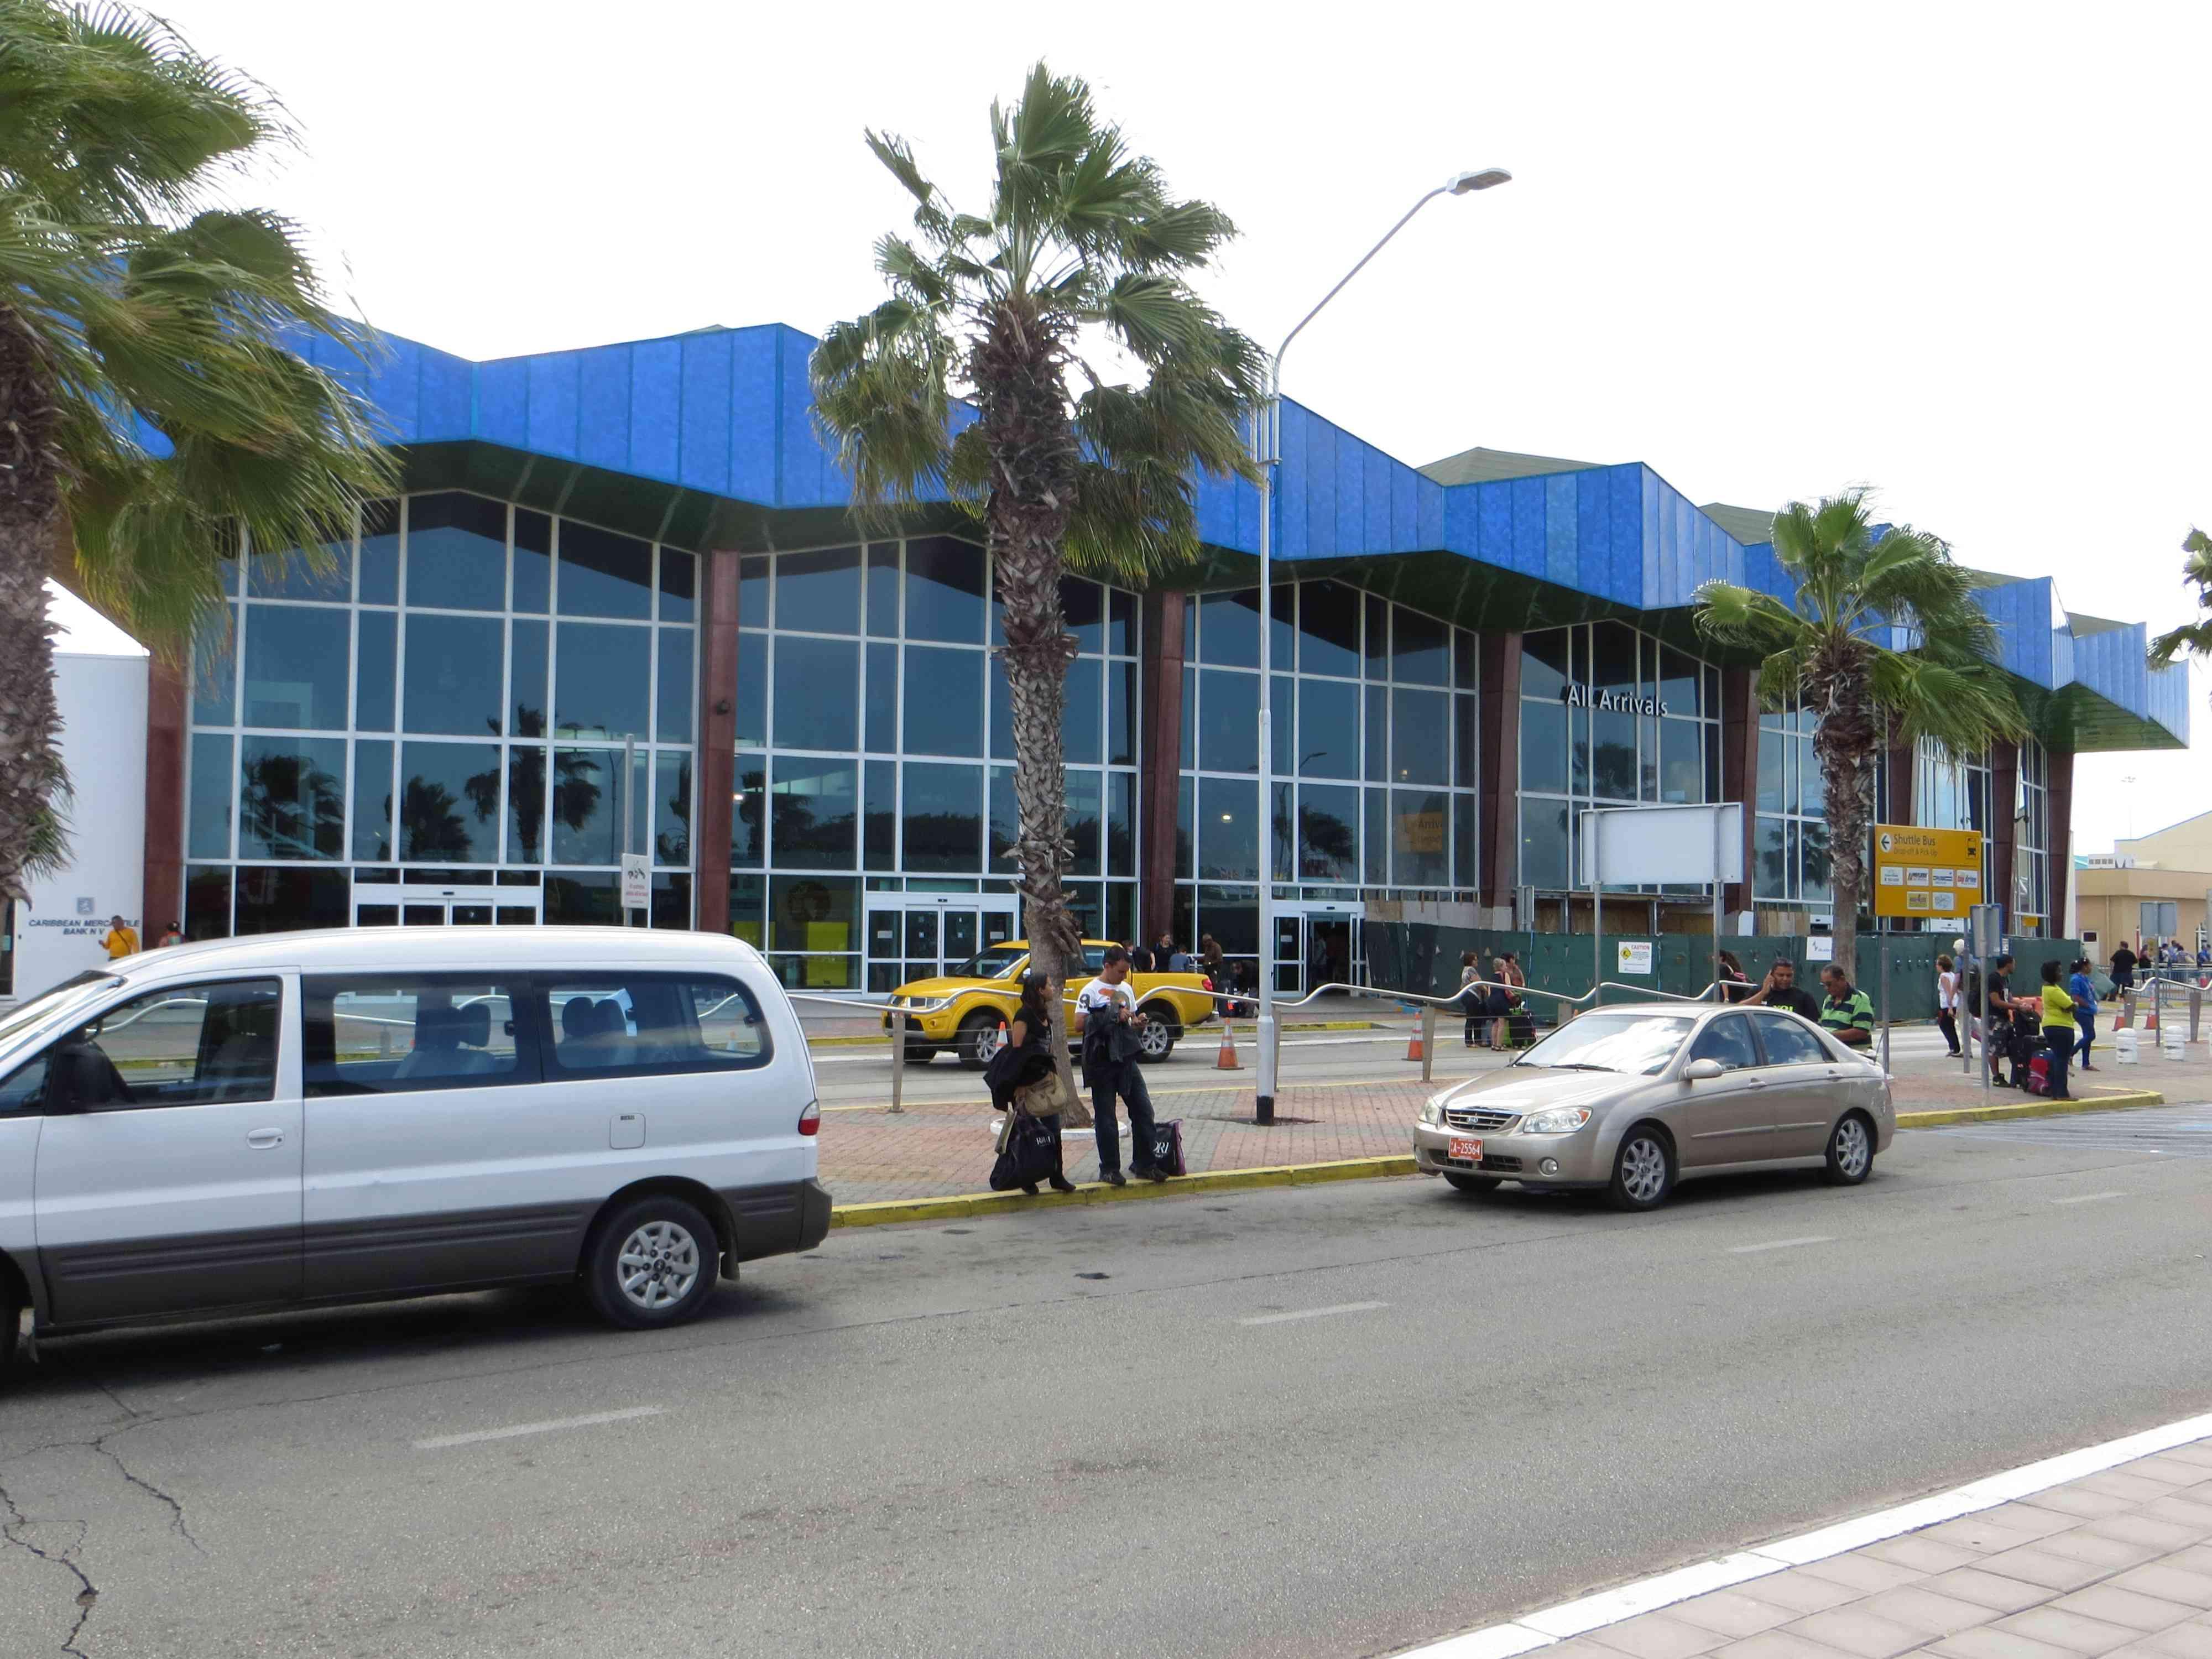 Queen Beatrix International Airport (AUA)